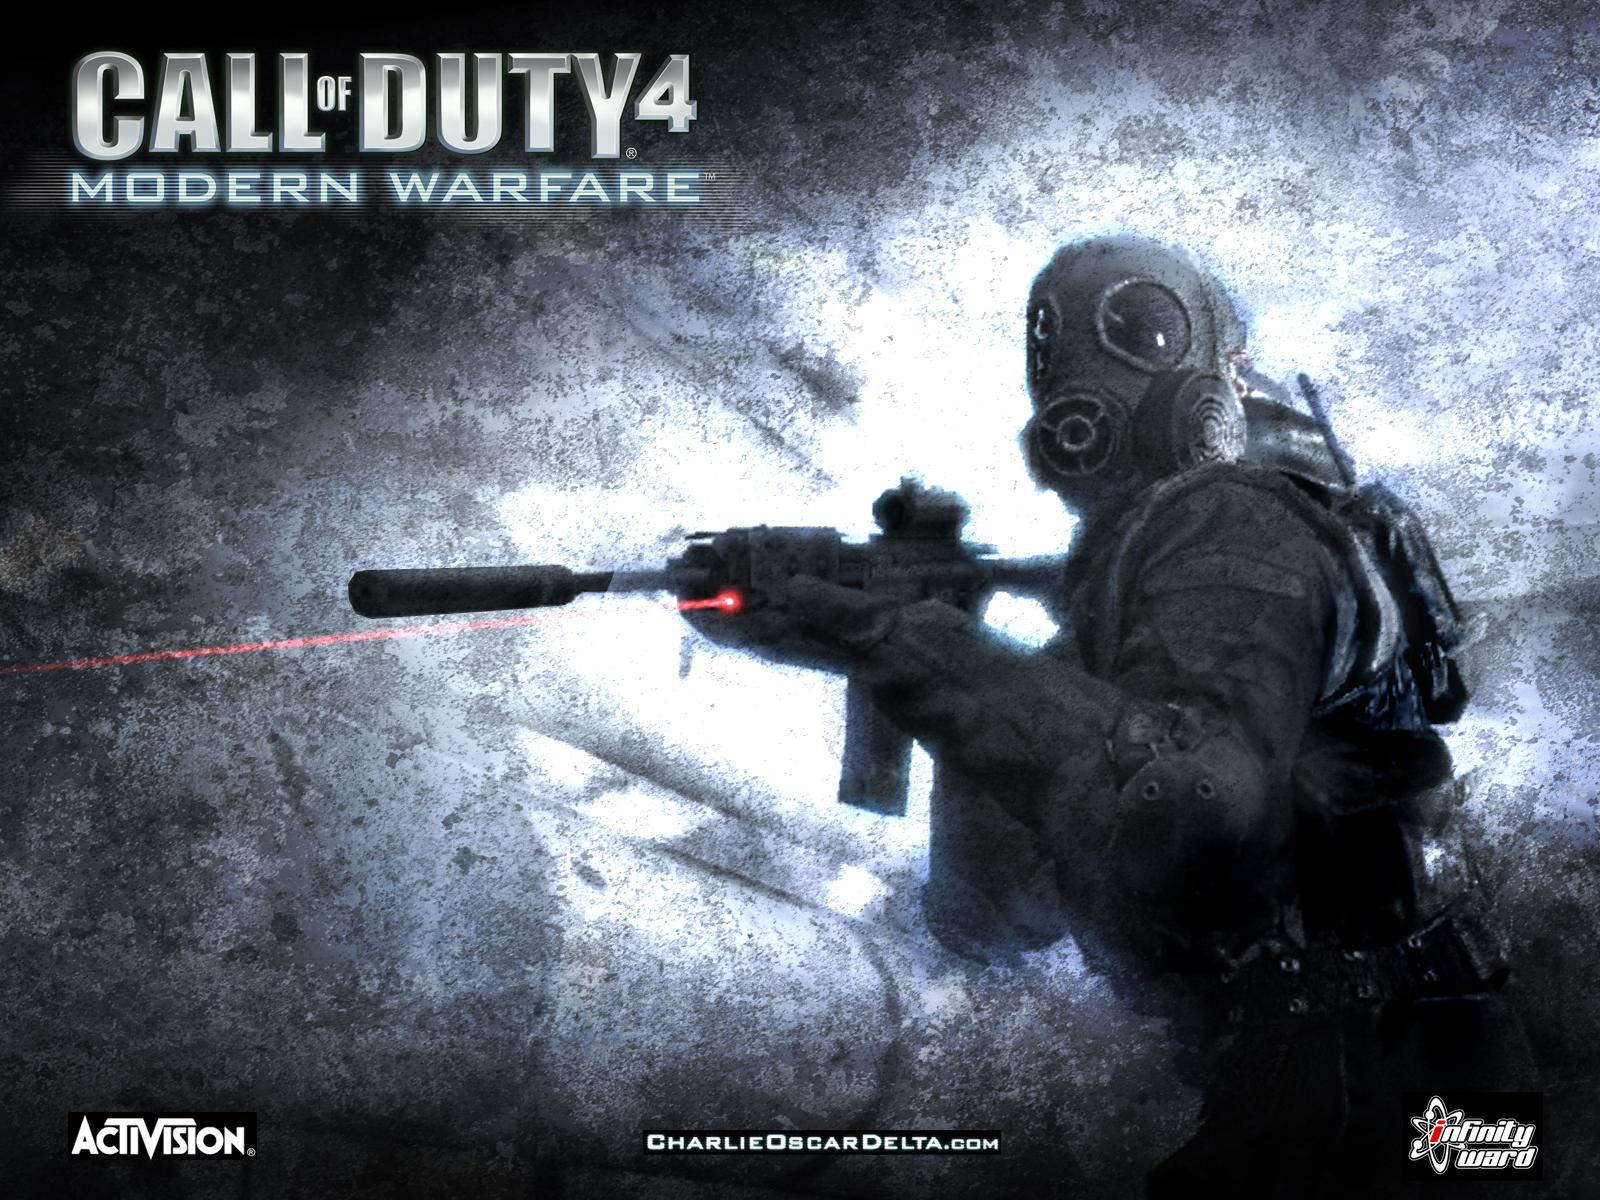 Call of Duty 4 Modern Warfare   Wallpaper 1 1600x1200